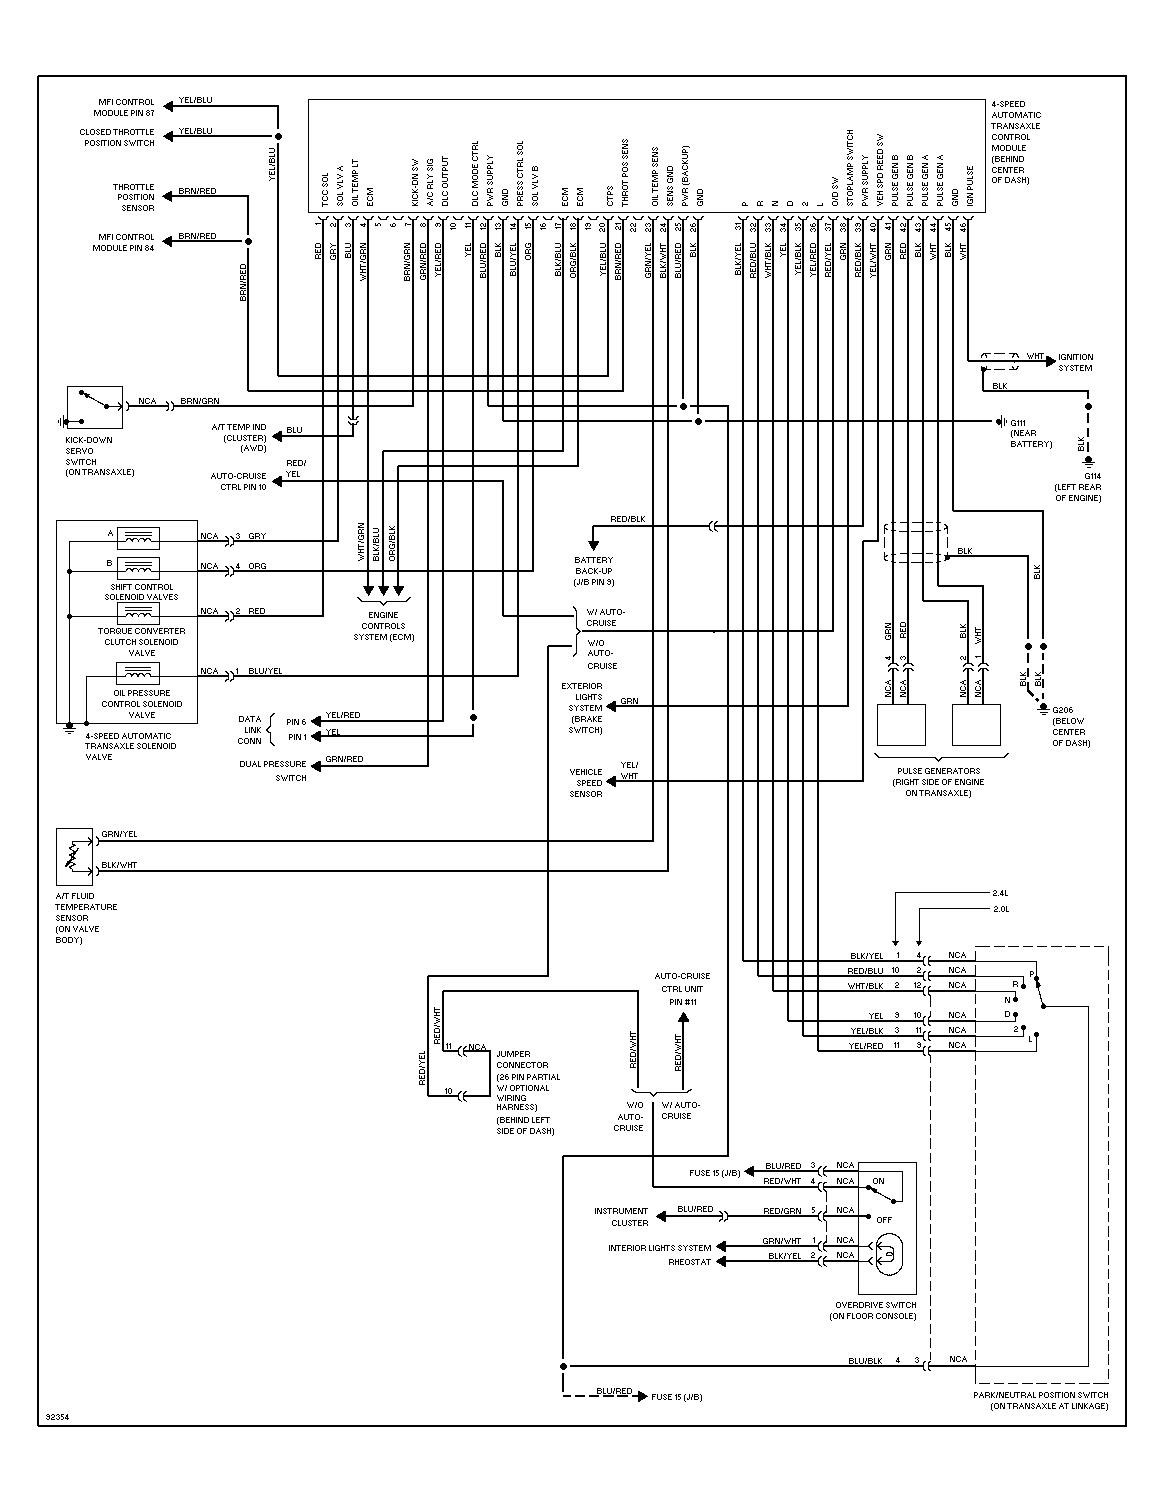 1999 Dodge Dakota Stereo Wiring Diagram Radio Wiring Diagram 97 Dakota Diagram Base Website 97